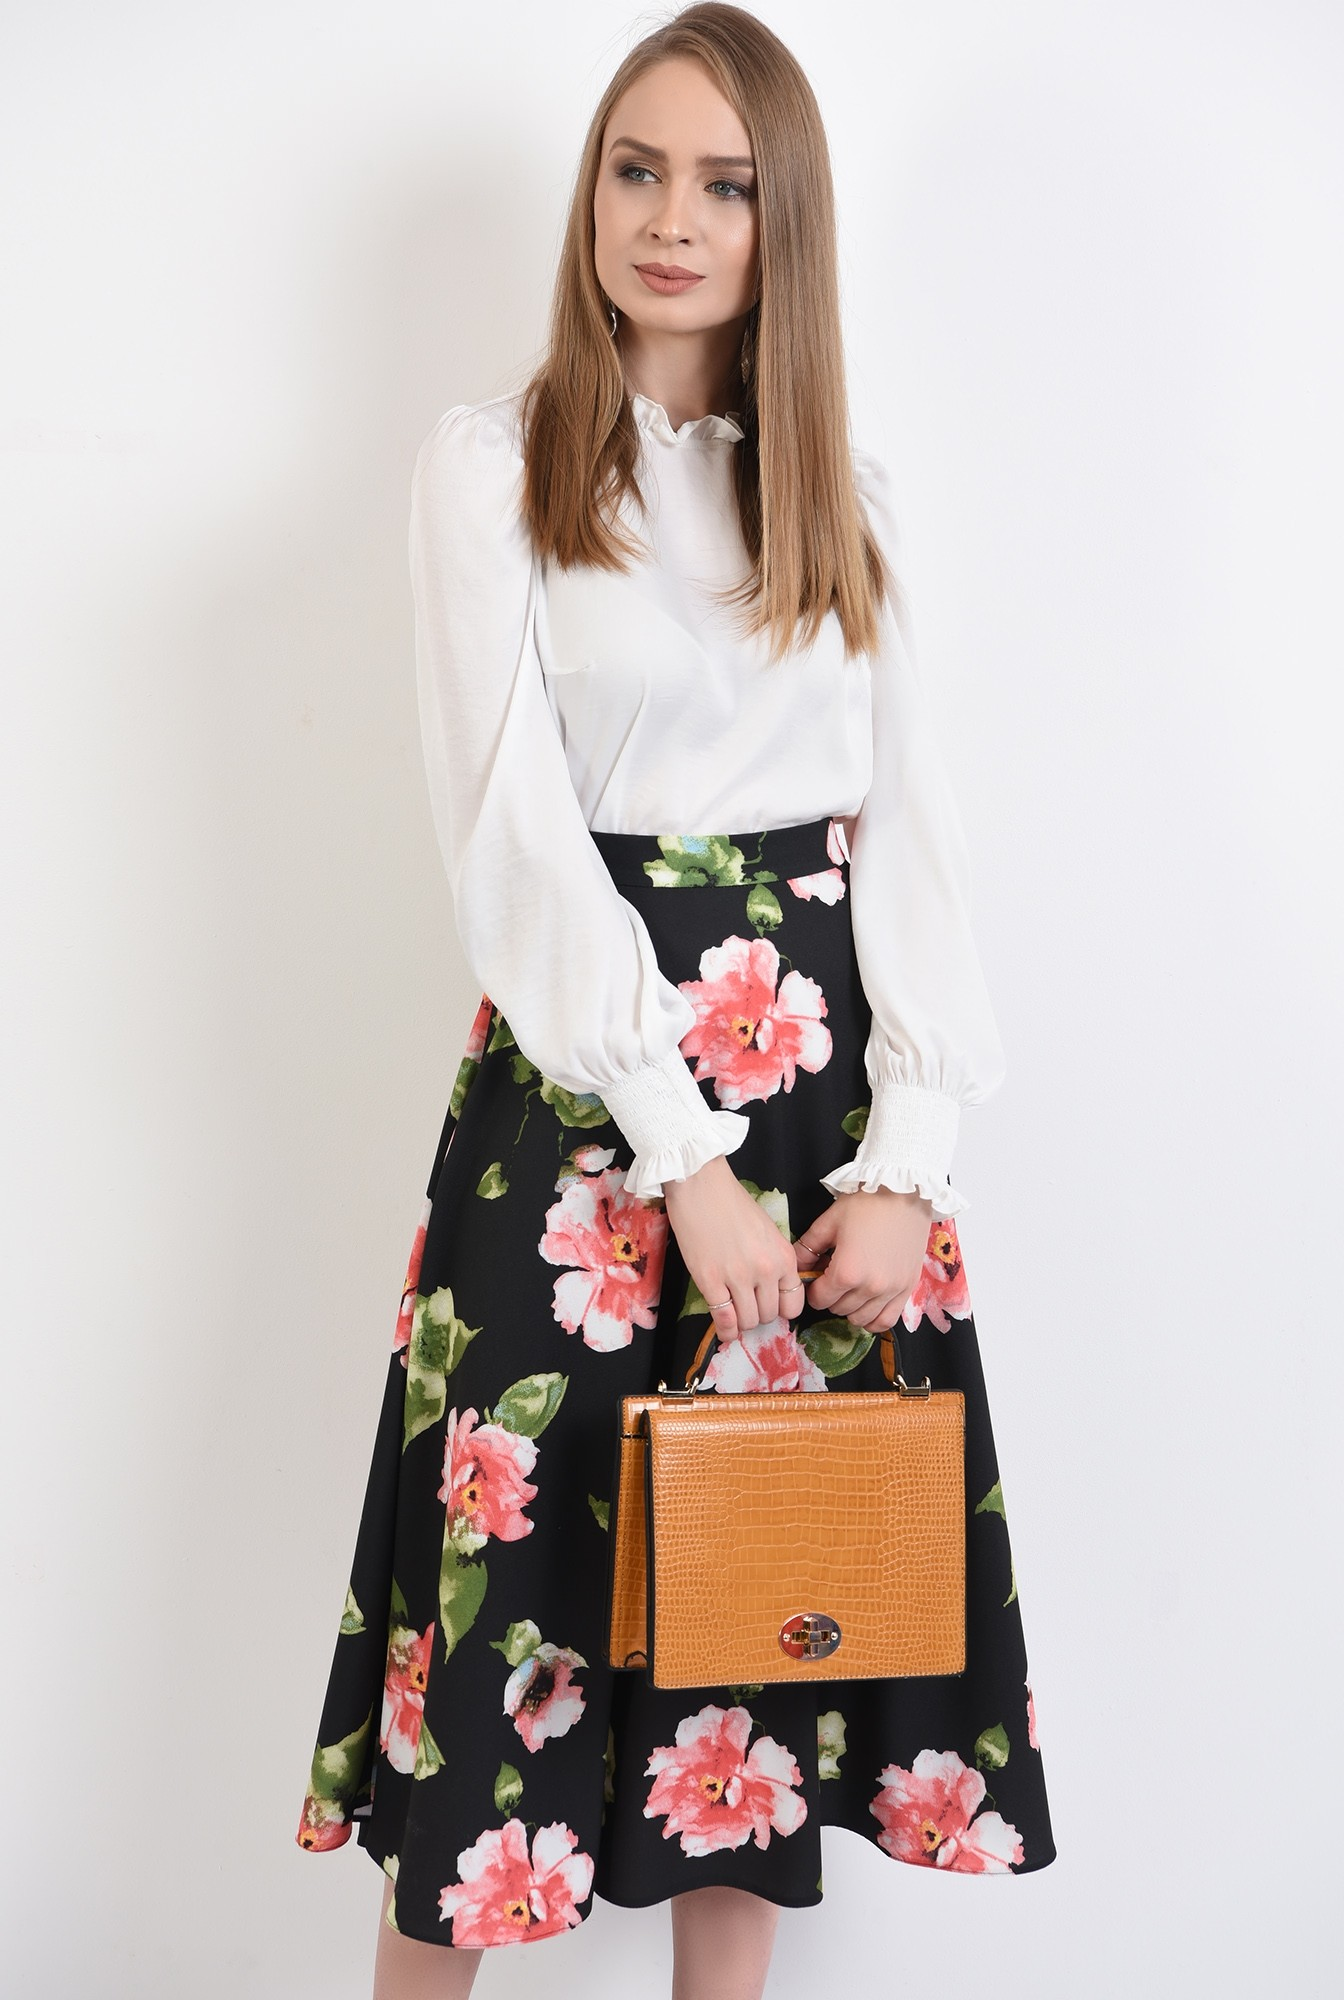 0 - 360 - fusta casual, cu flori, midi, talie inalta, fusta de primavara